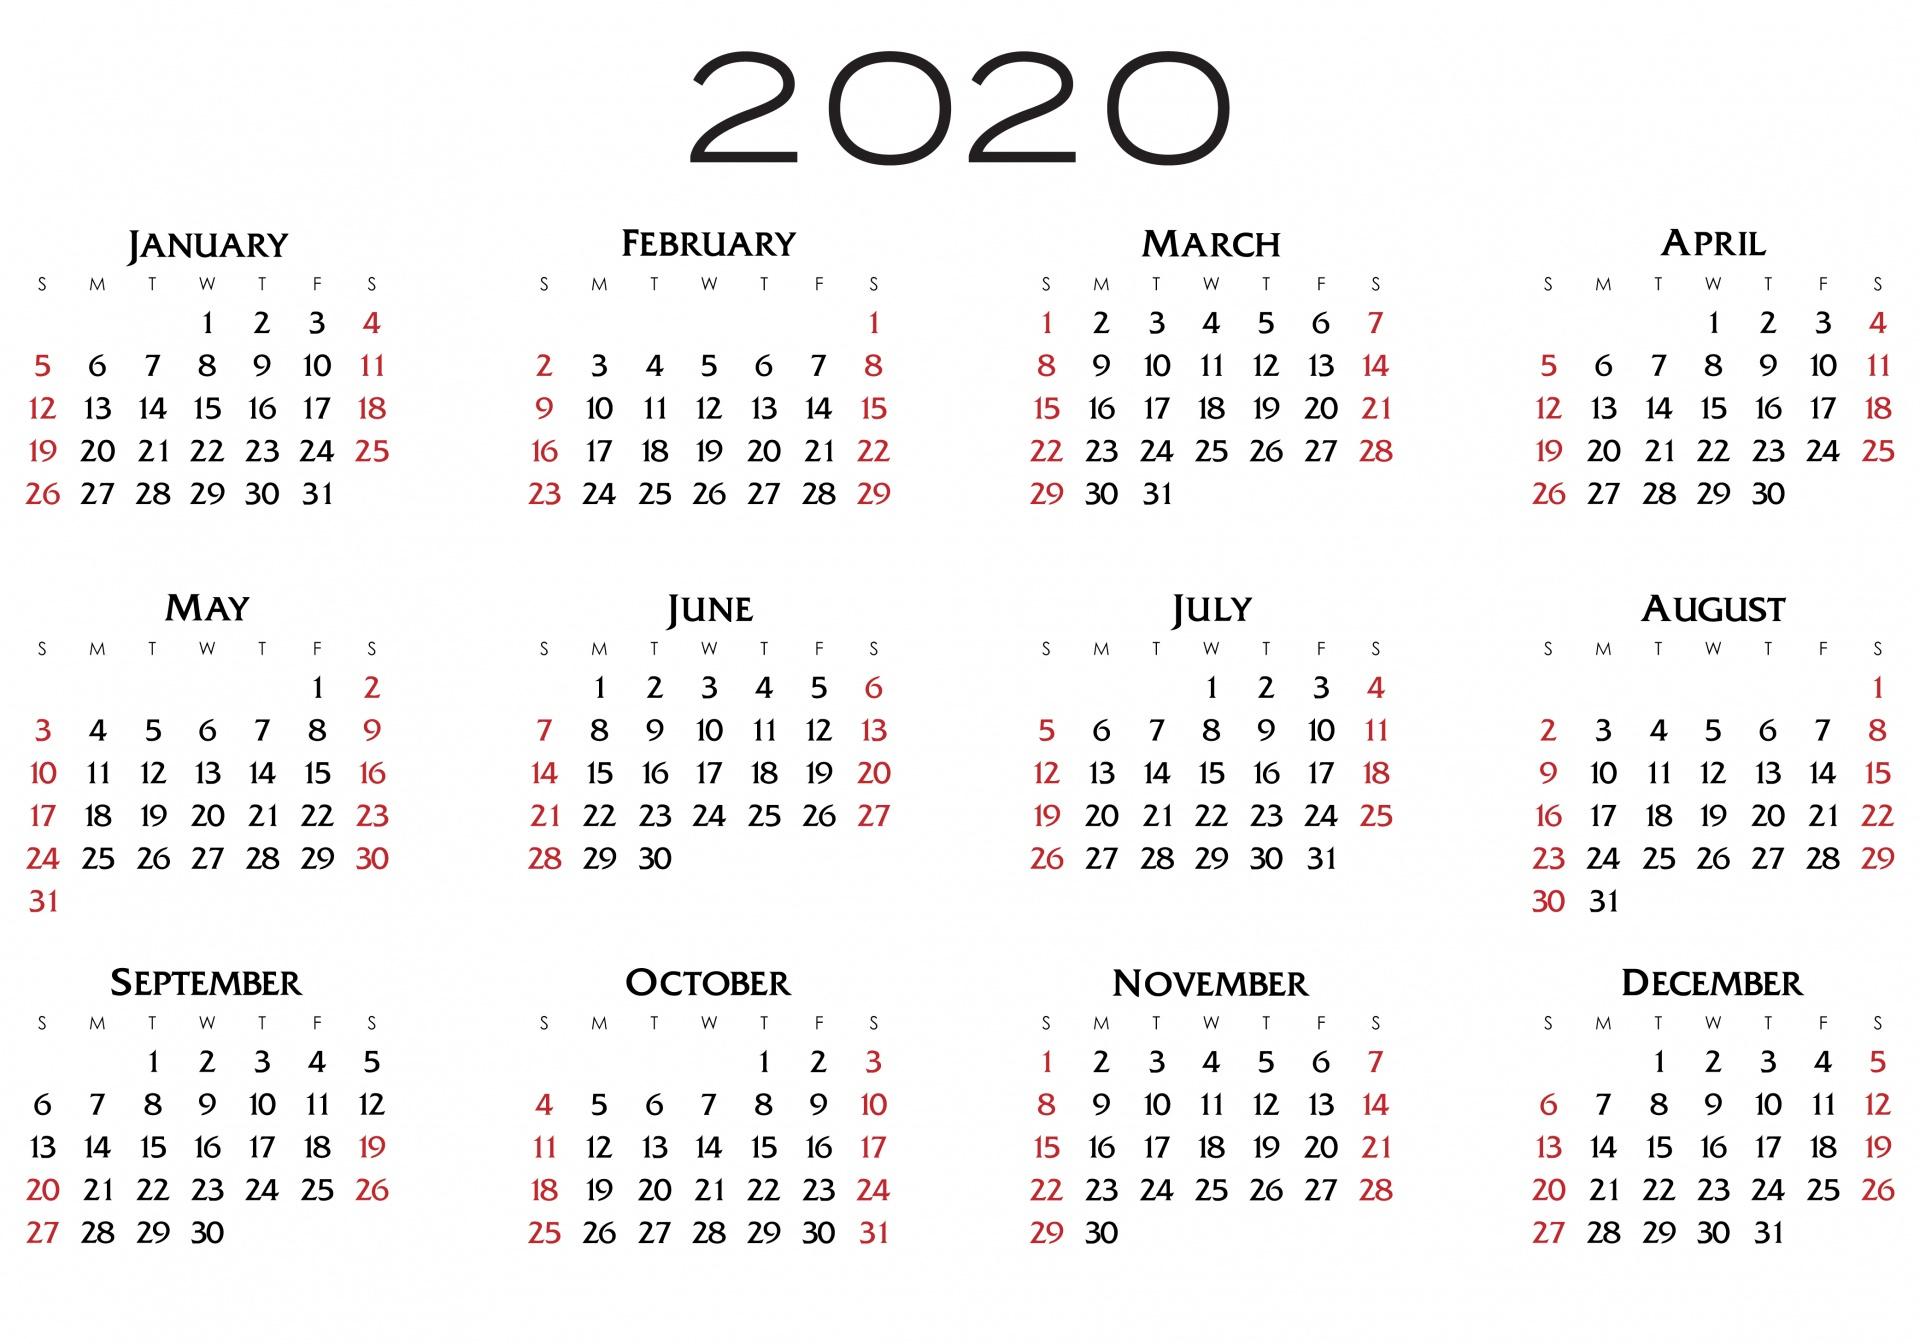 2020 Calendar Free Stock Photo - Public Domain Pictures